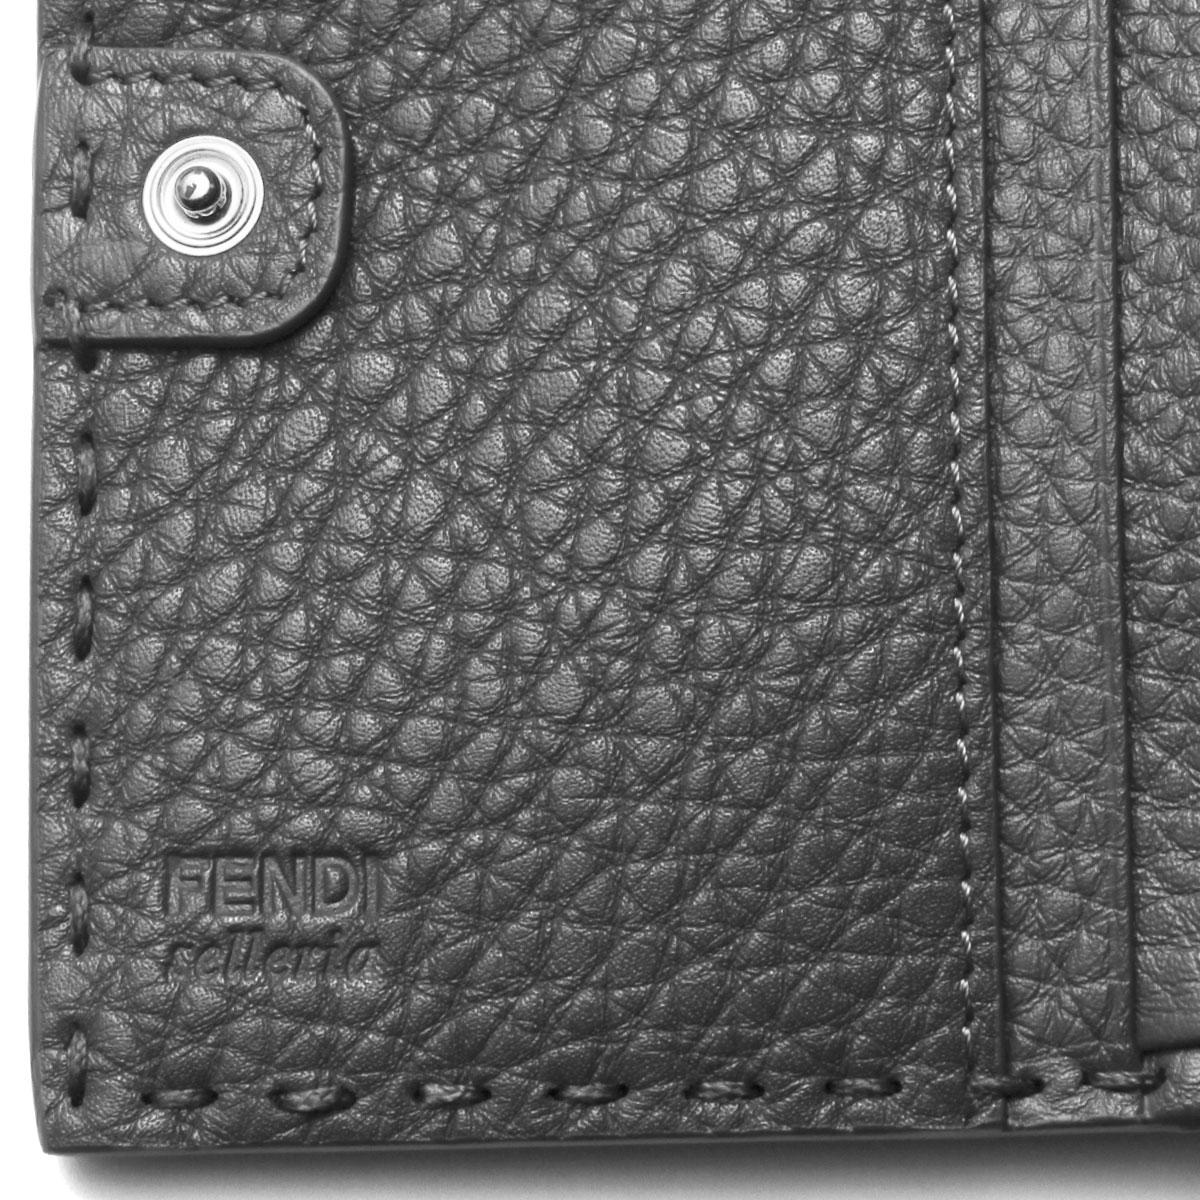 ae46791ecc ... Fendi FENDI wallet Lady's 8M0359 SFR F0JGZ folio wallet medium PEEKABOO  SELLERIA ピーカブーセレリア ASFALTO+ ...